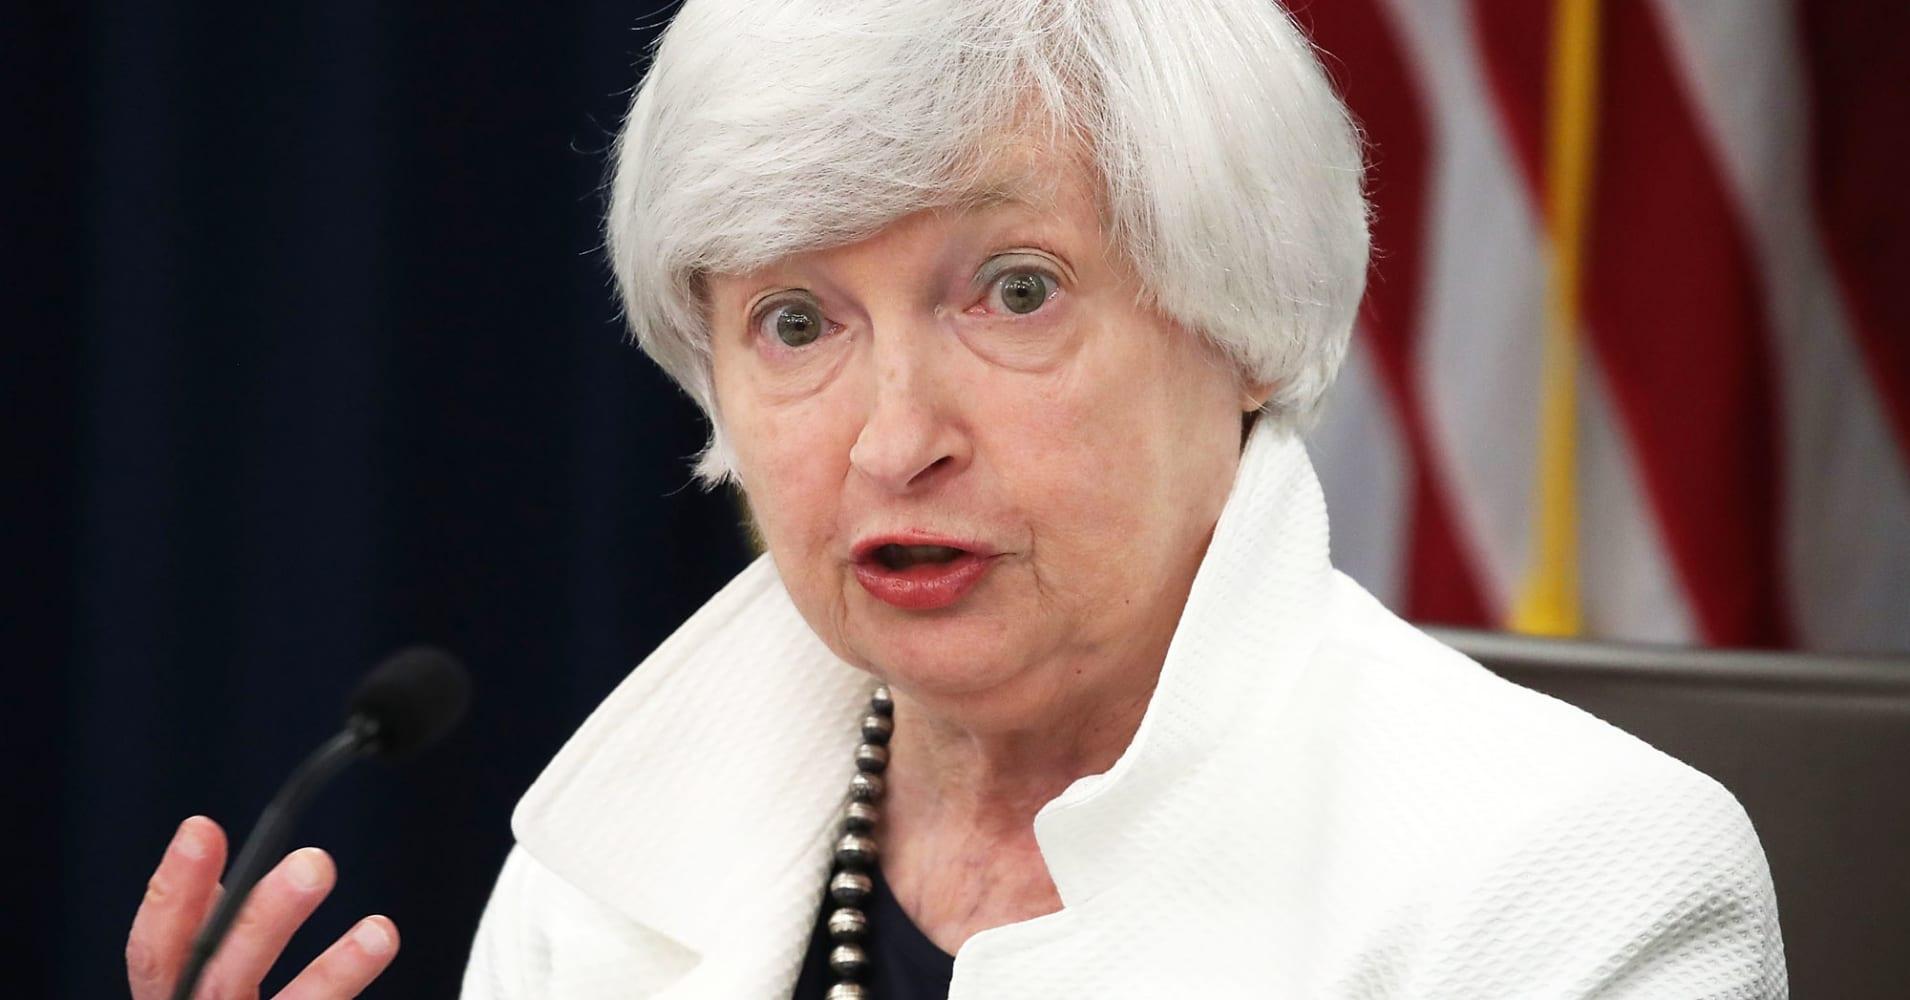 Live blog: Dollar near one-month high as Yellen takes hawkish stance